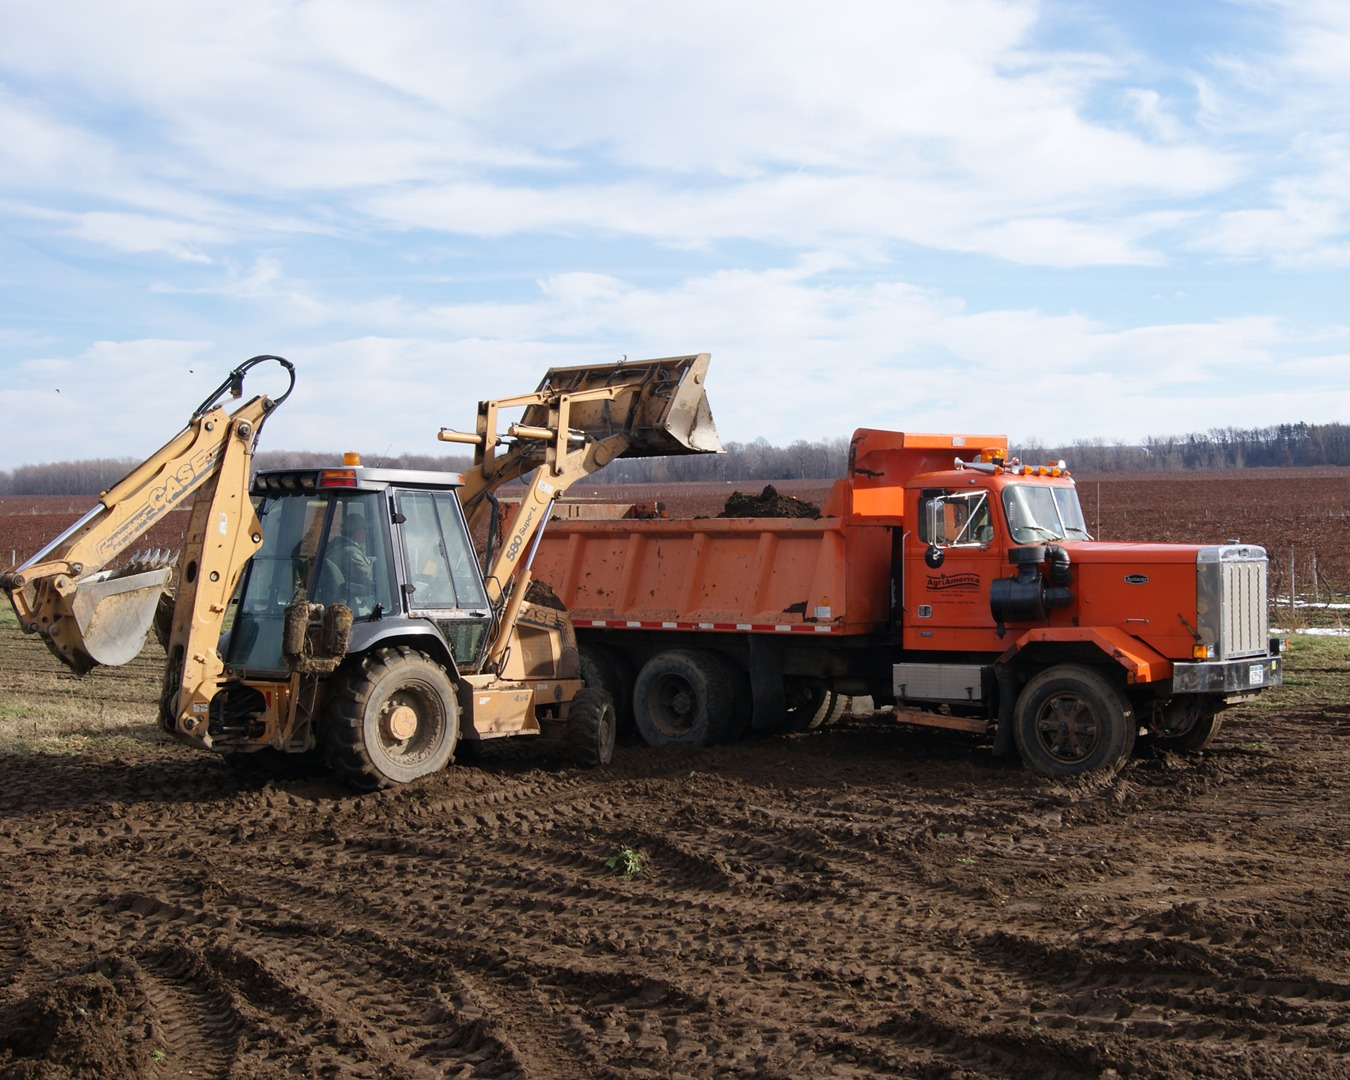 Site Clearing Dumpster Services-Colorado's Premier Dumpster Rental Services